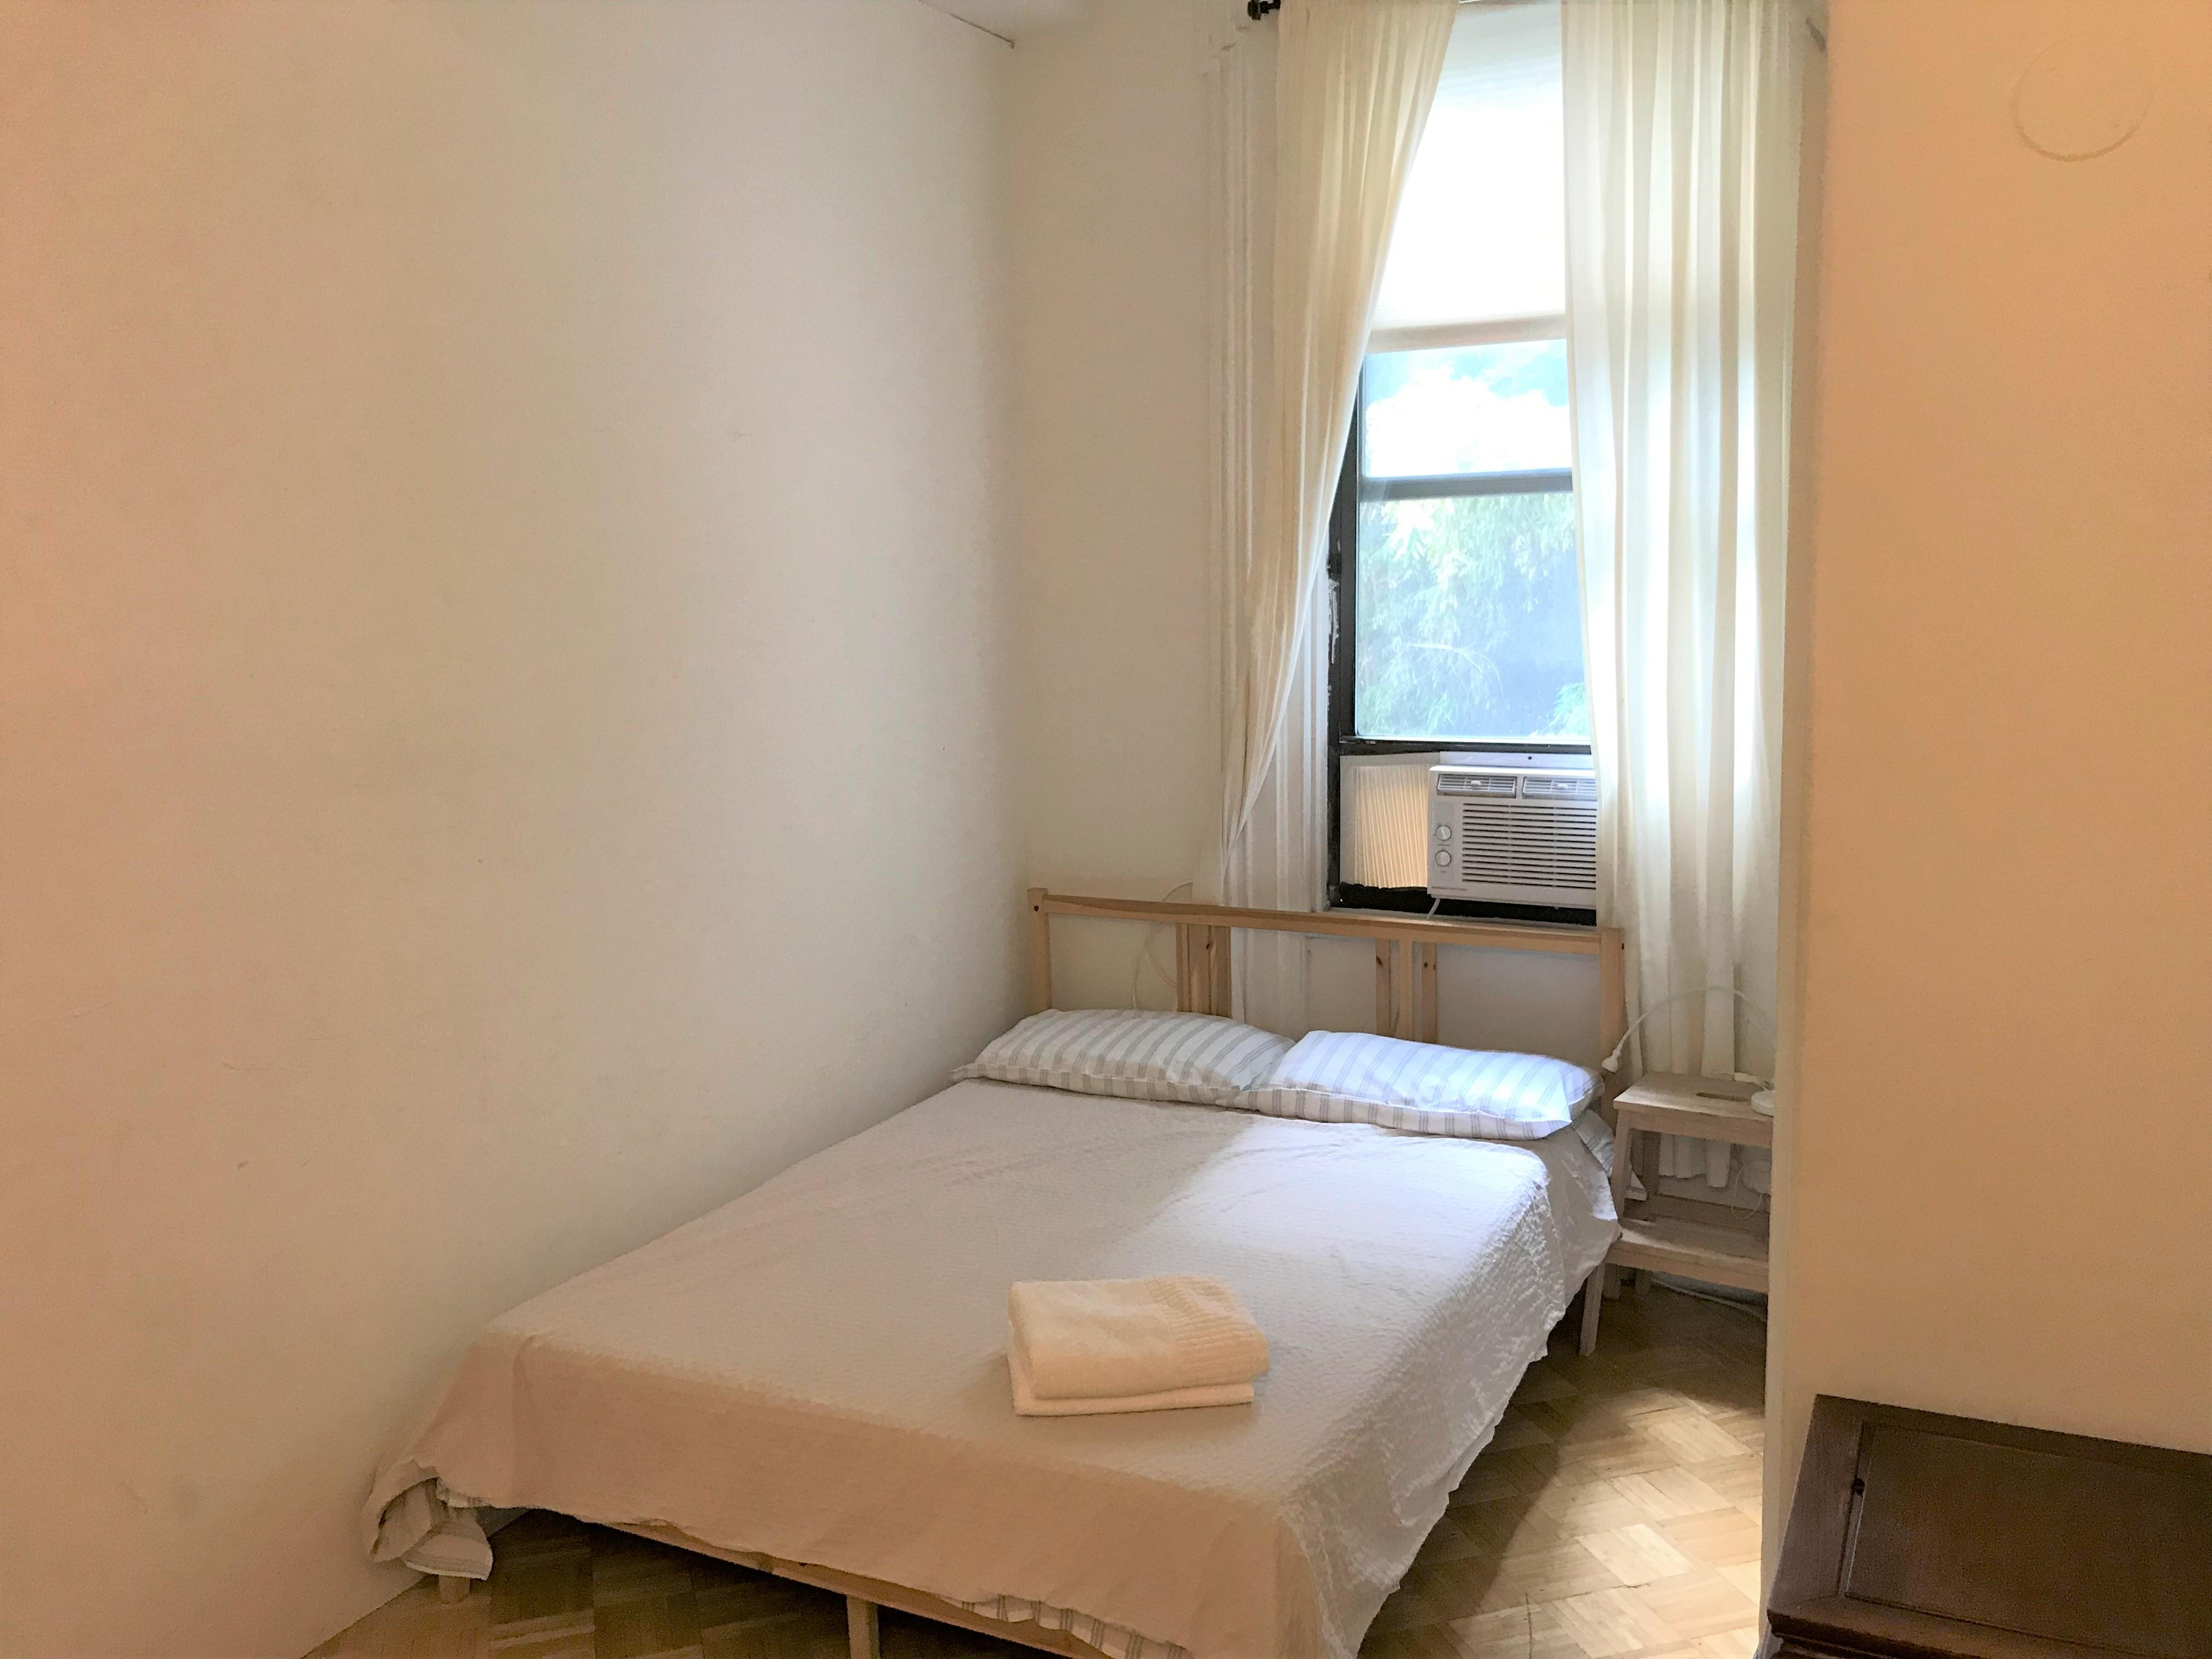 Apartment Park Avenue 3 Bedroom 1 Bath photo 8522855